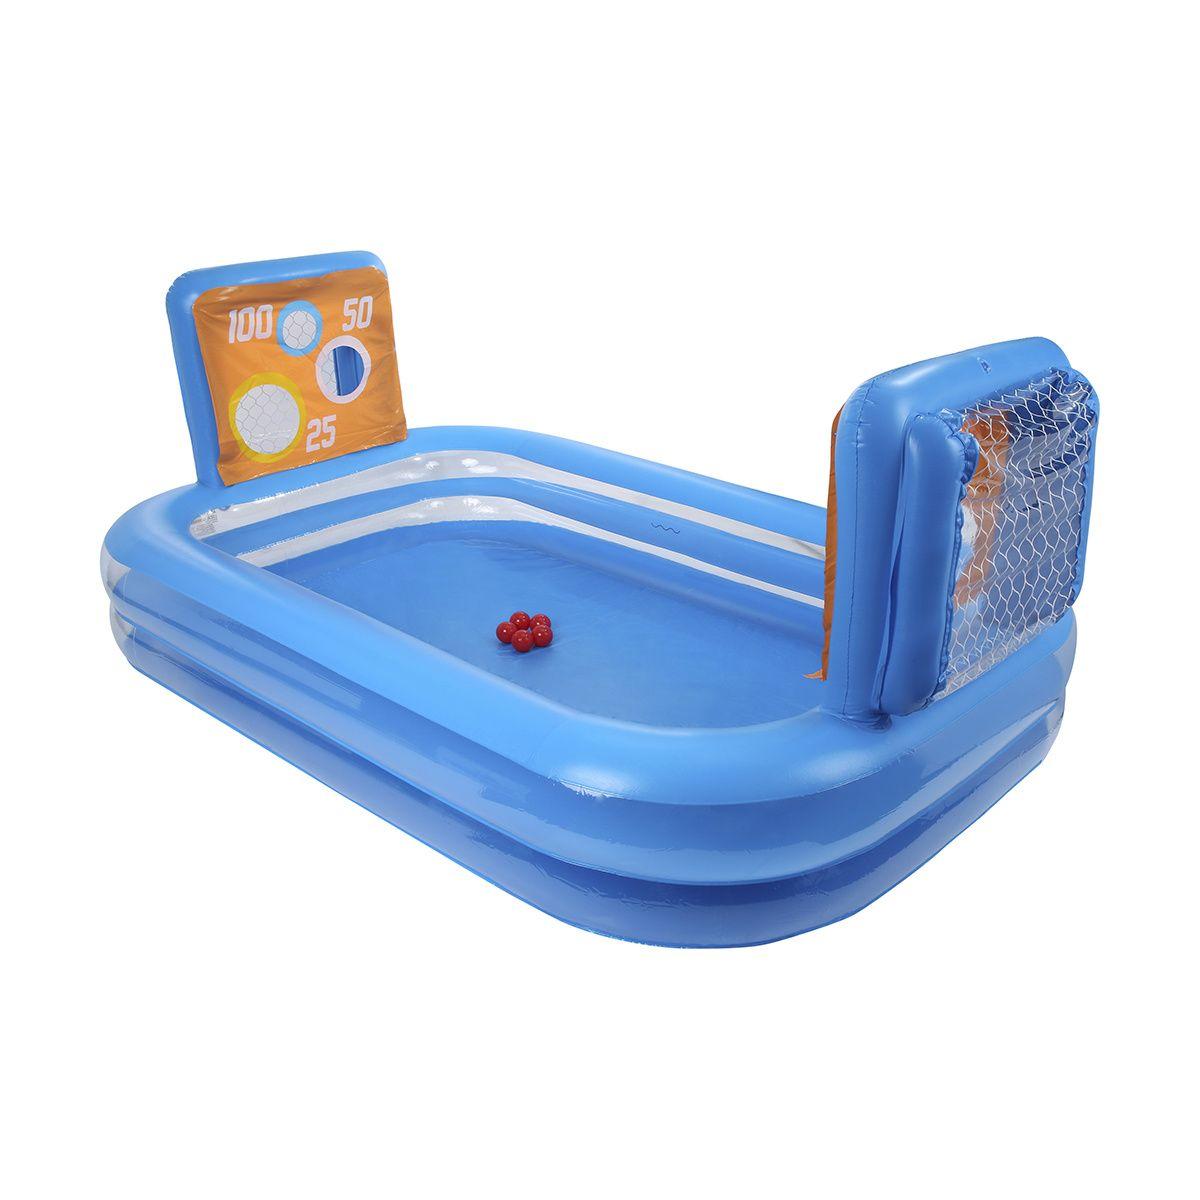 Skill Shot Play Pool | Kmart | Kids Stuff | Play pool, Play ...